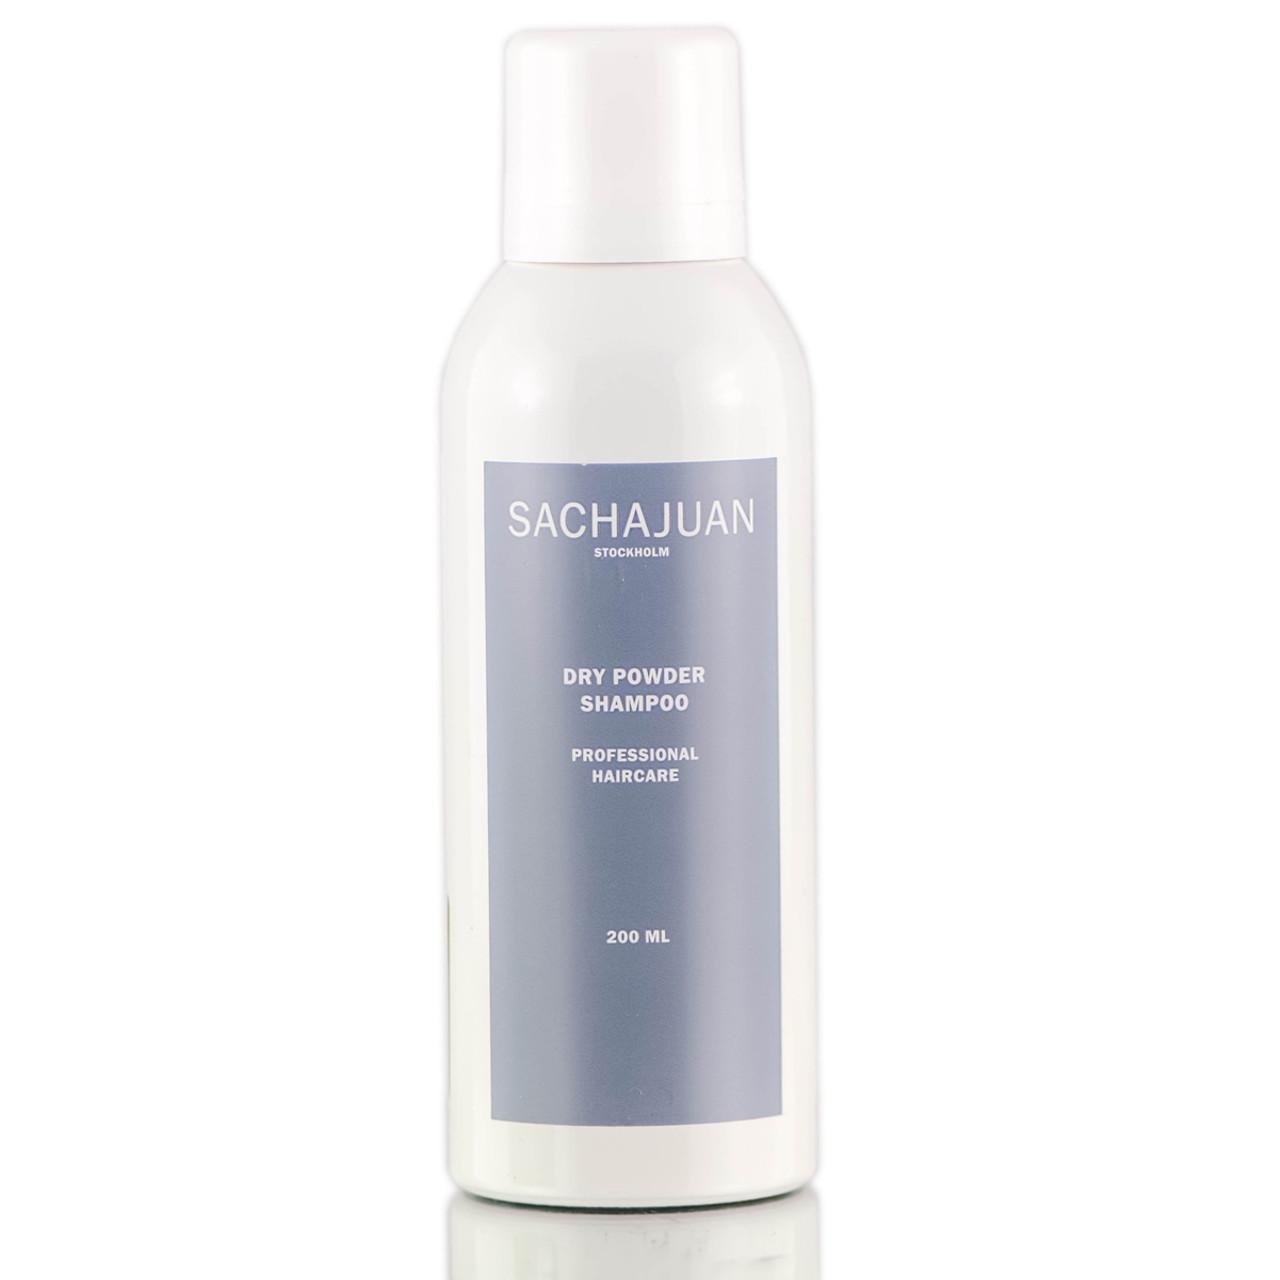 Dry powder shampoo